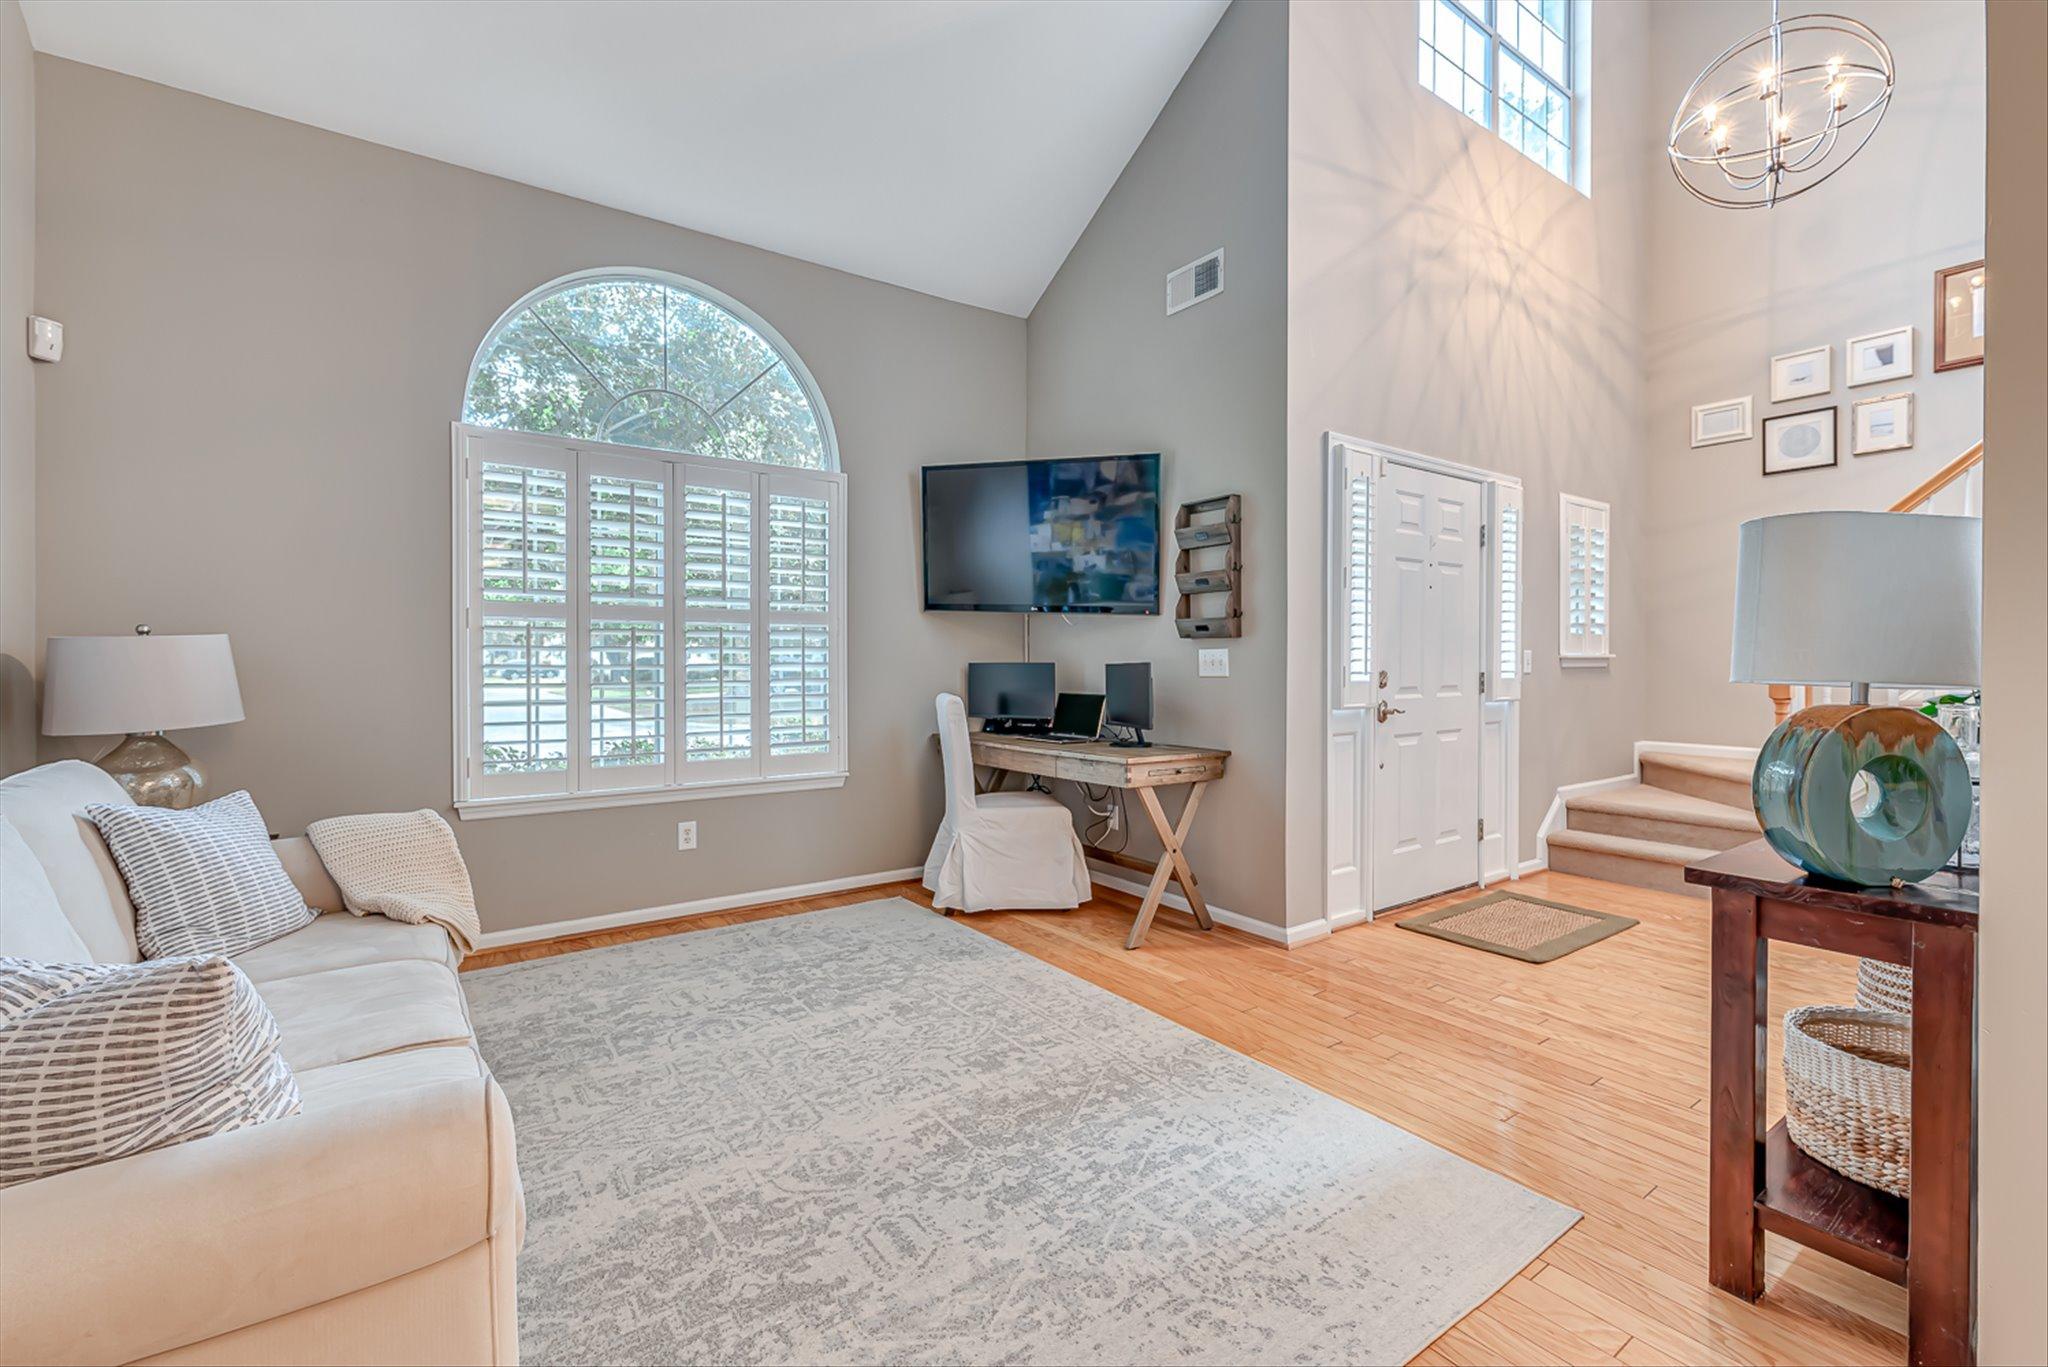 Belle Hall Homes For Sale - 278 Jardinere, Mount Pleasant, SC - 37